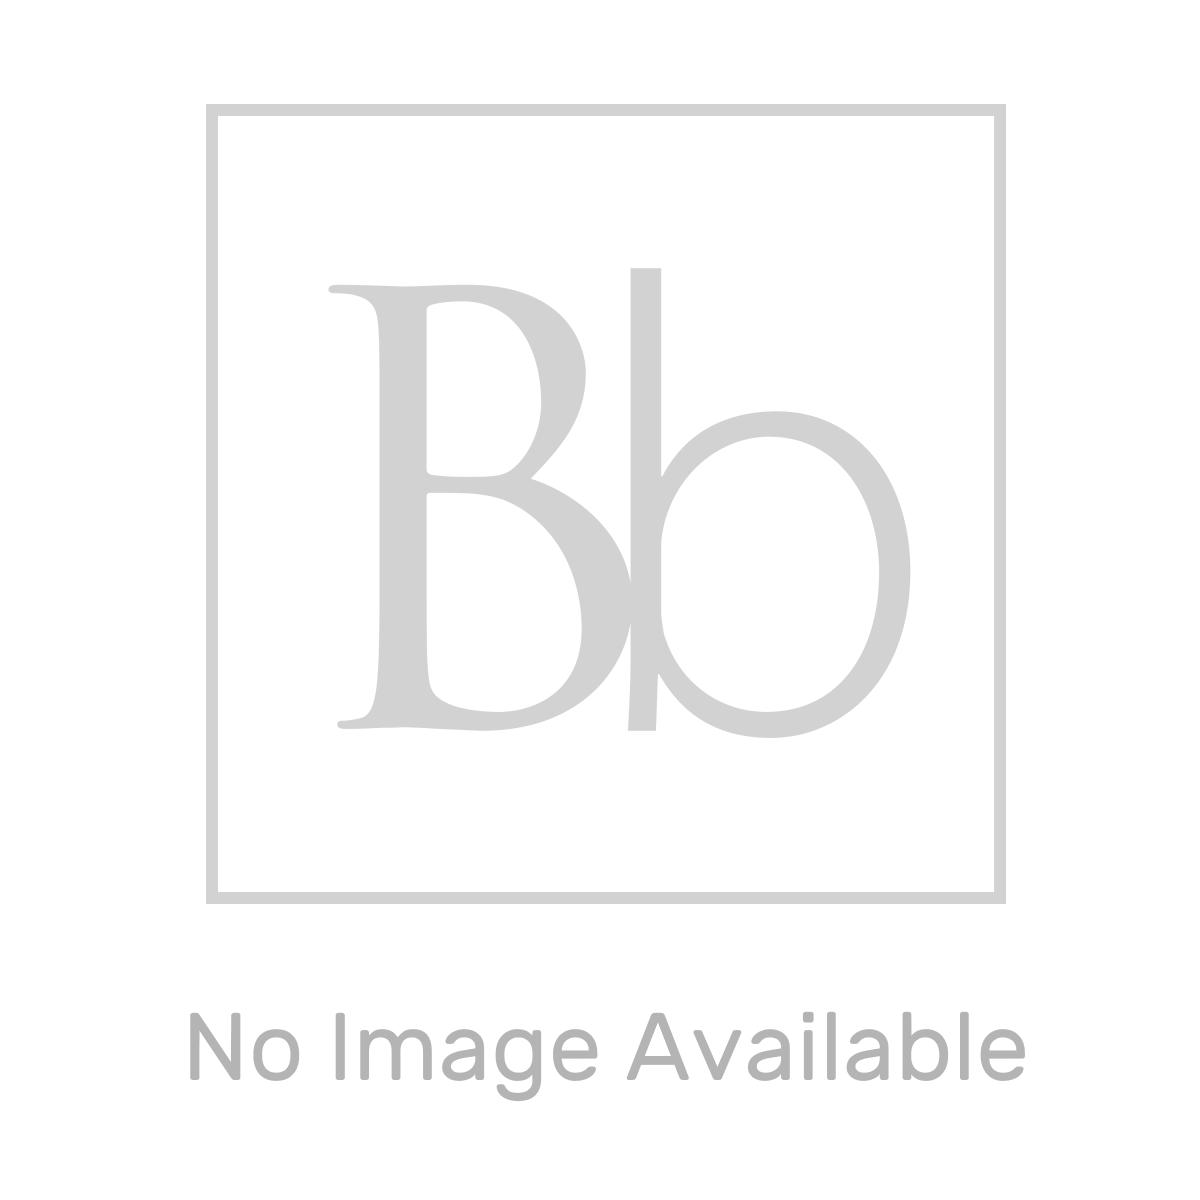 Croydex White Woven Stripe Textile Shower Curtain Detail